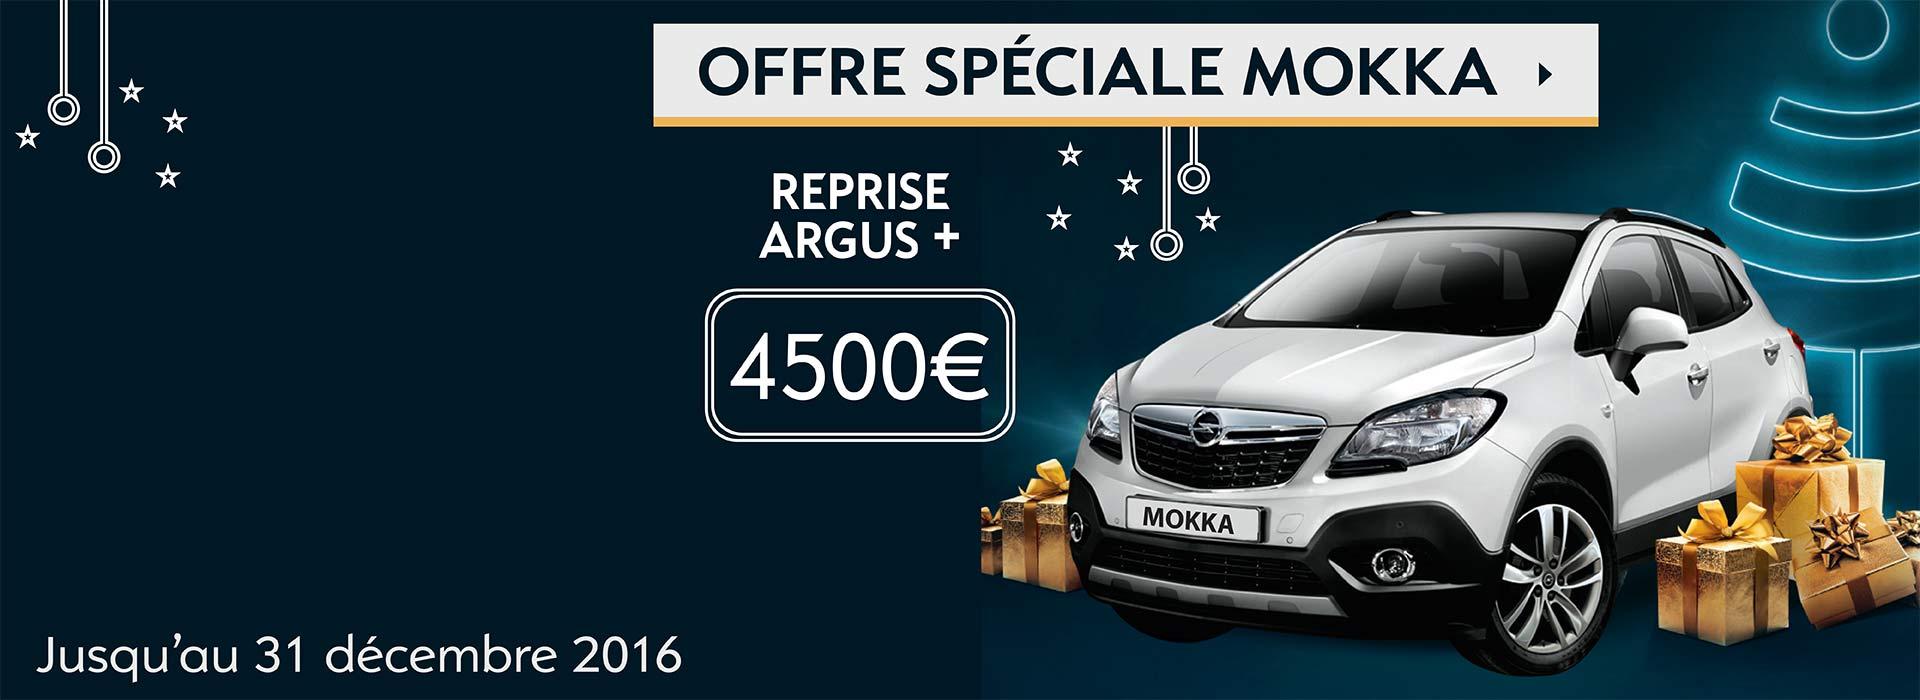 Opel metz vente voiture neuve vehicule occasion for Garage vente voiture occasion metz